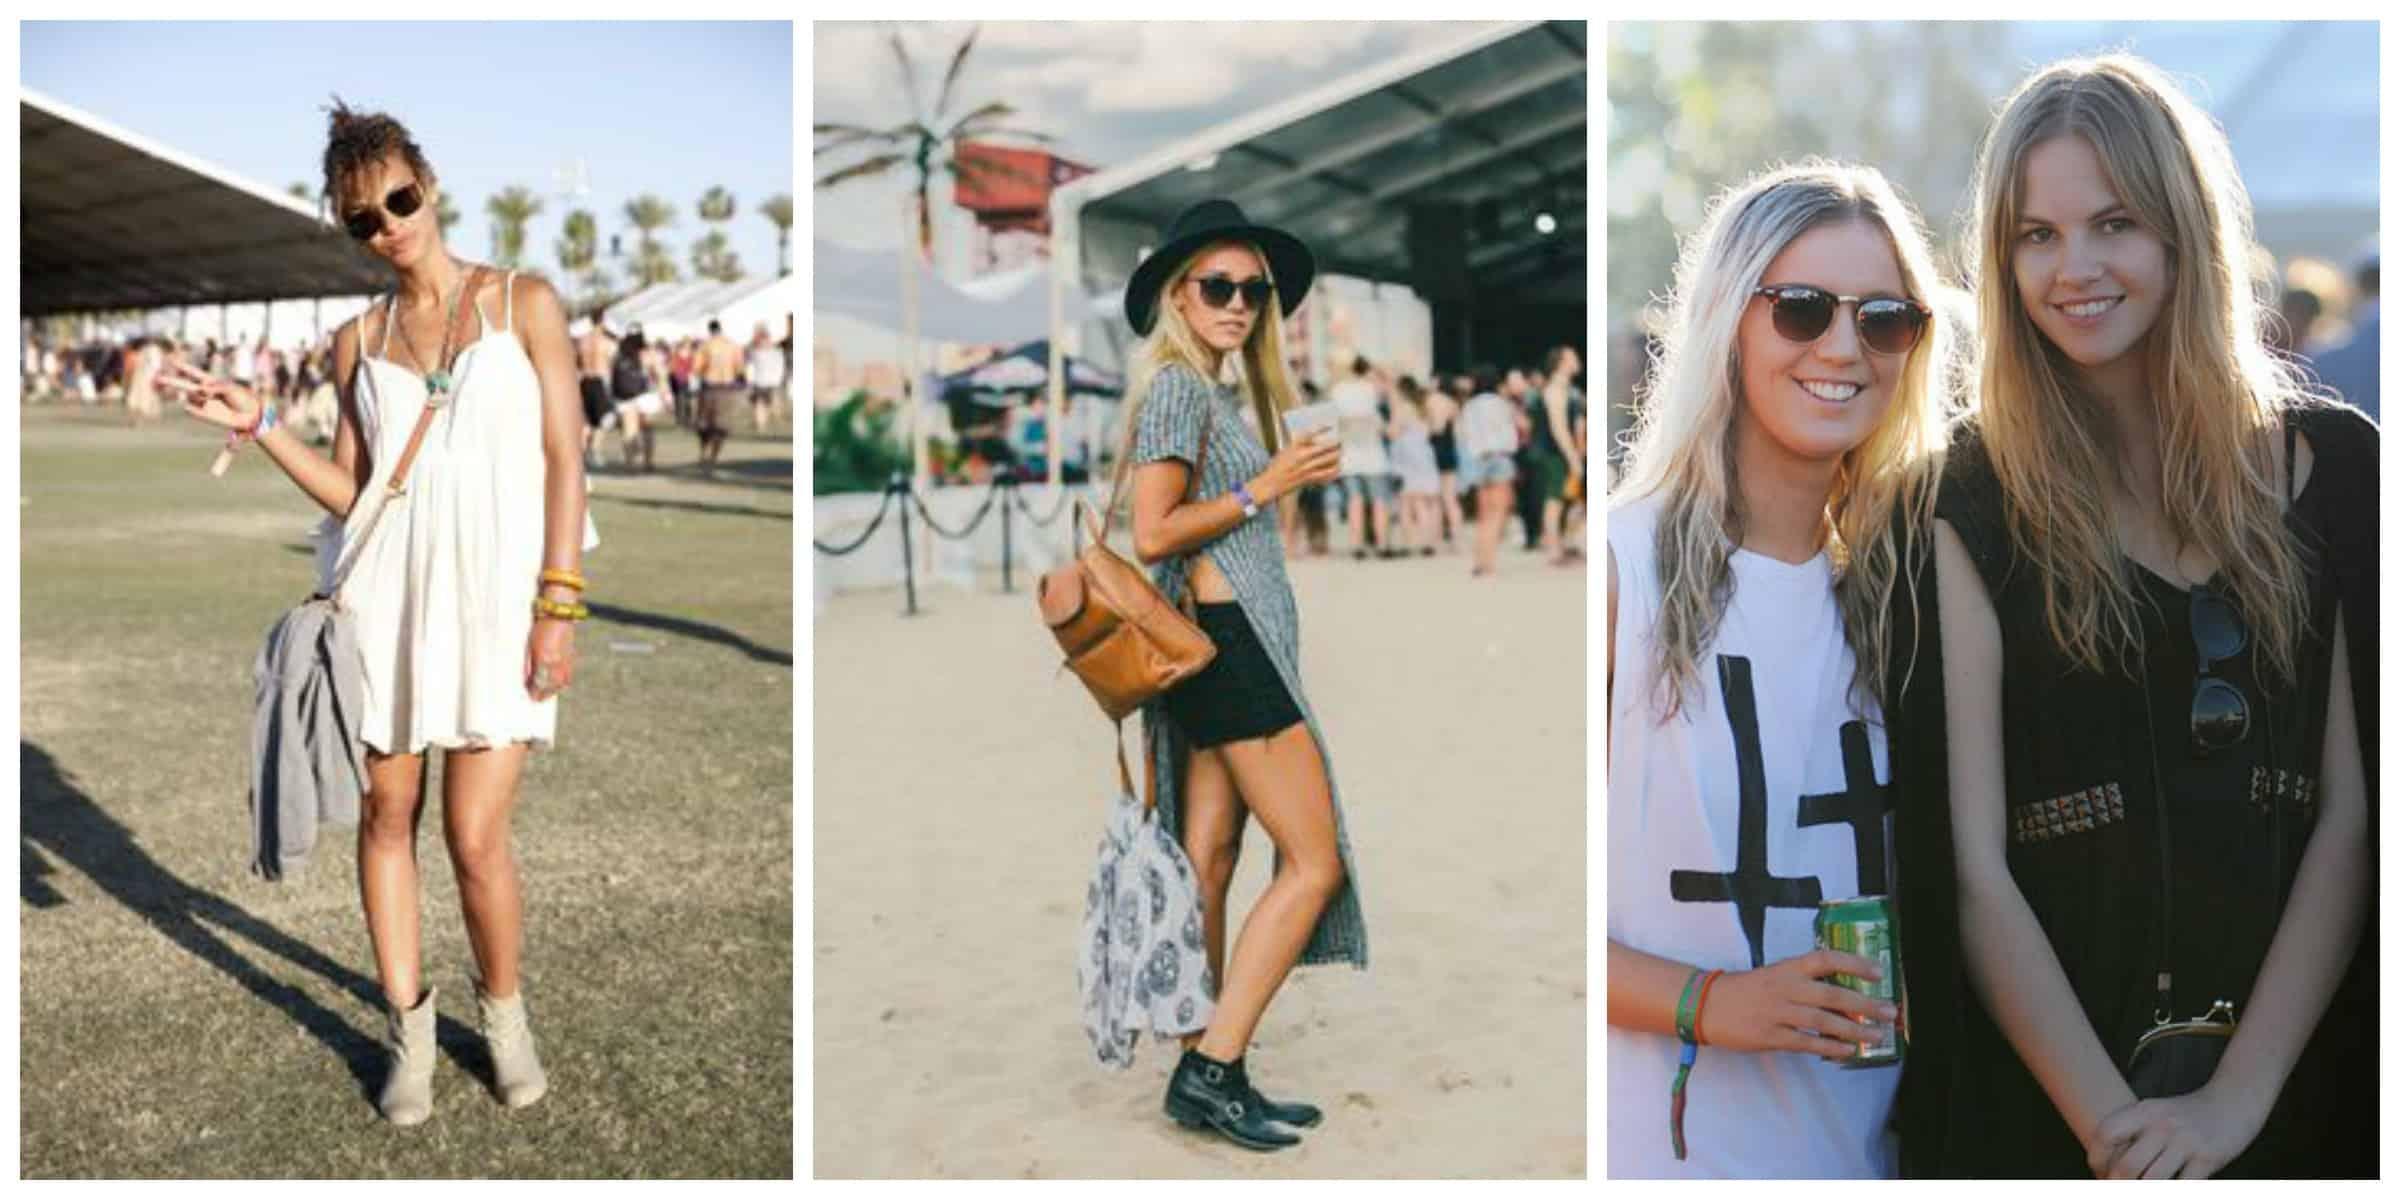 music-festivals-looks